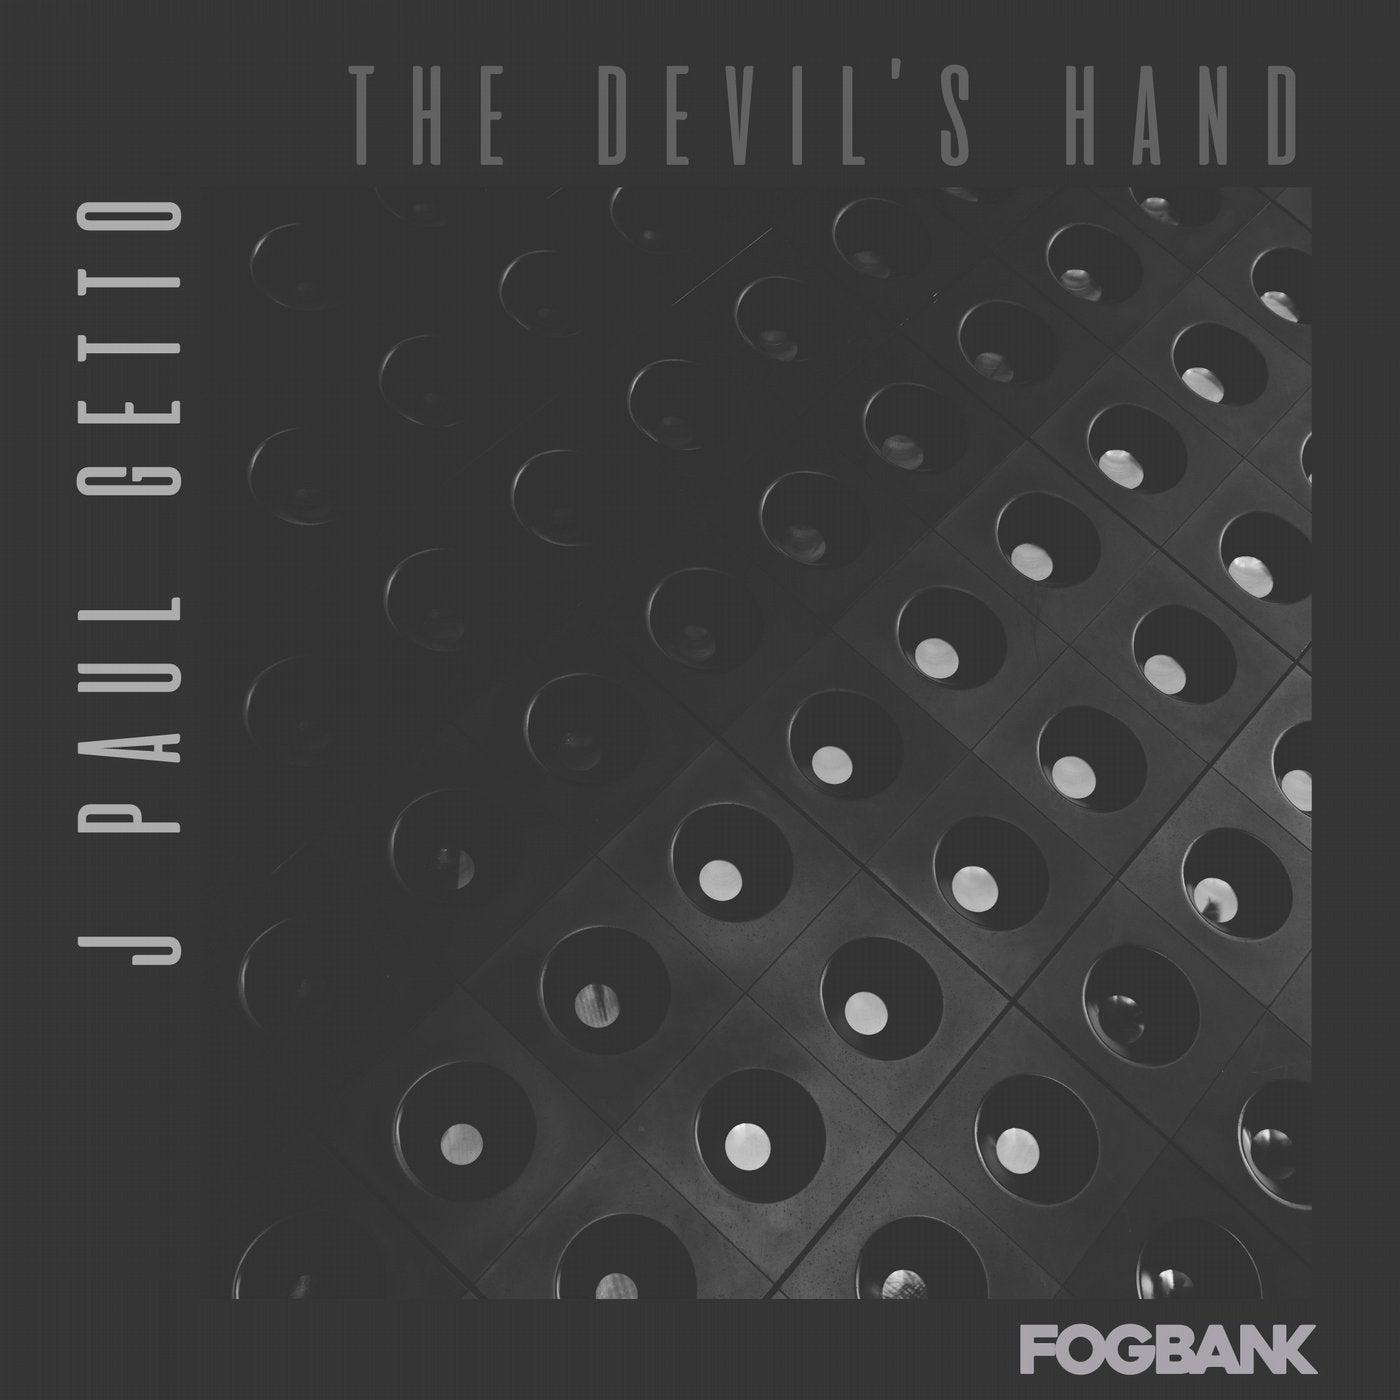 The Devil's Hand (Original Mix)